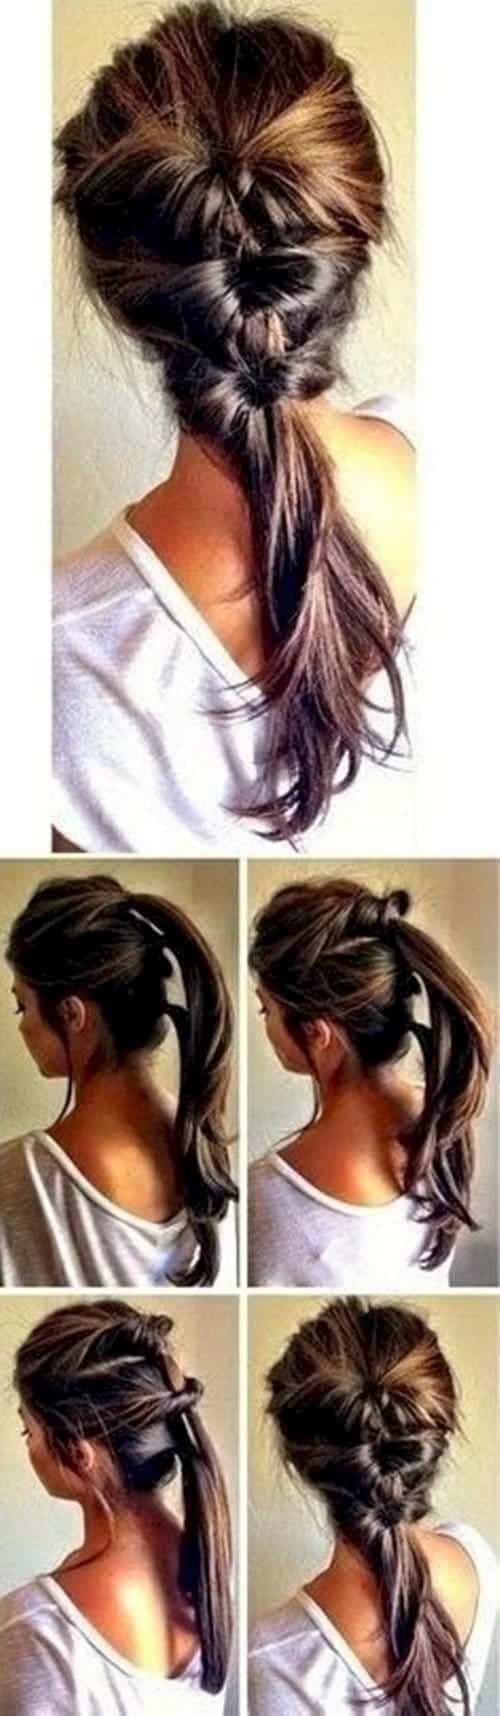 ponytails-triple